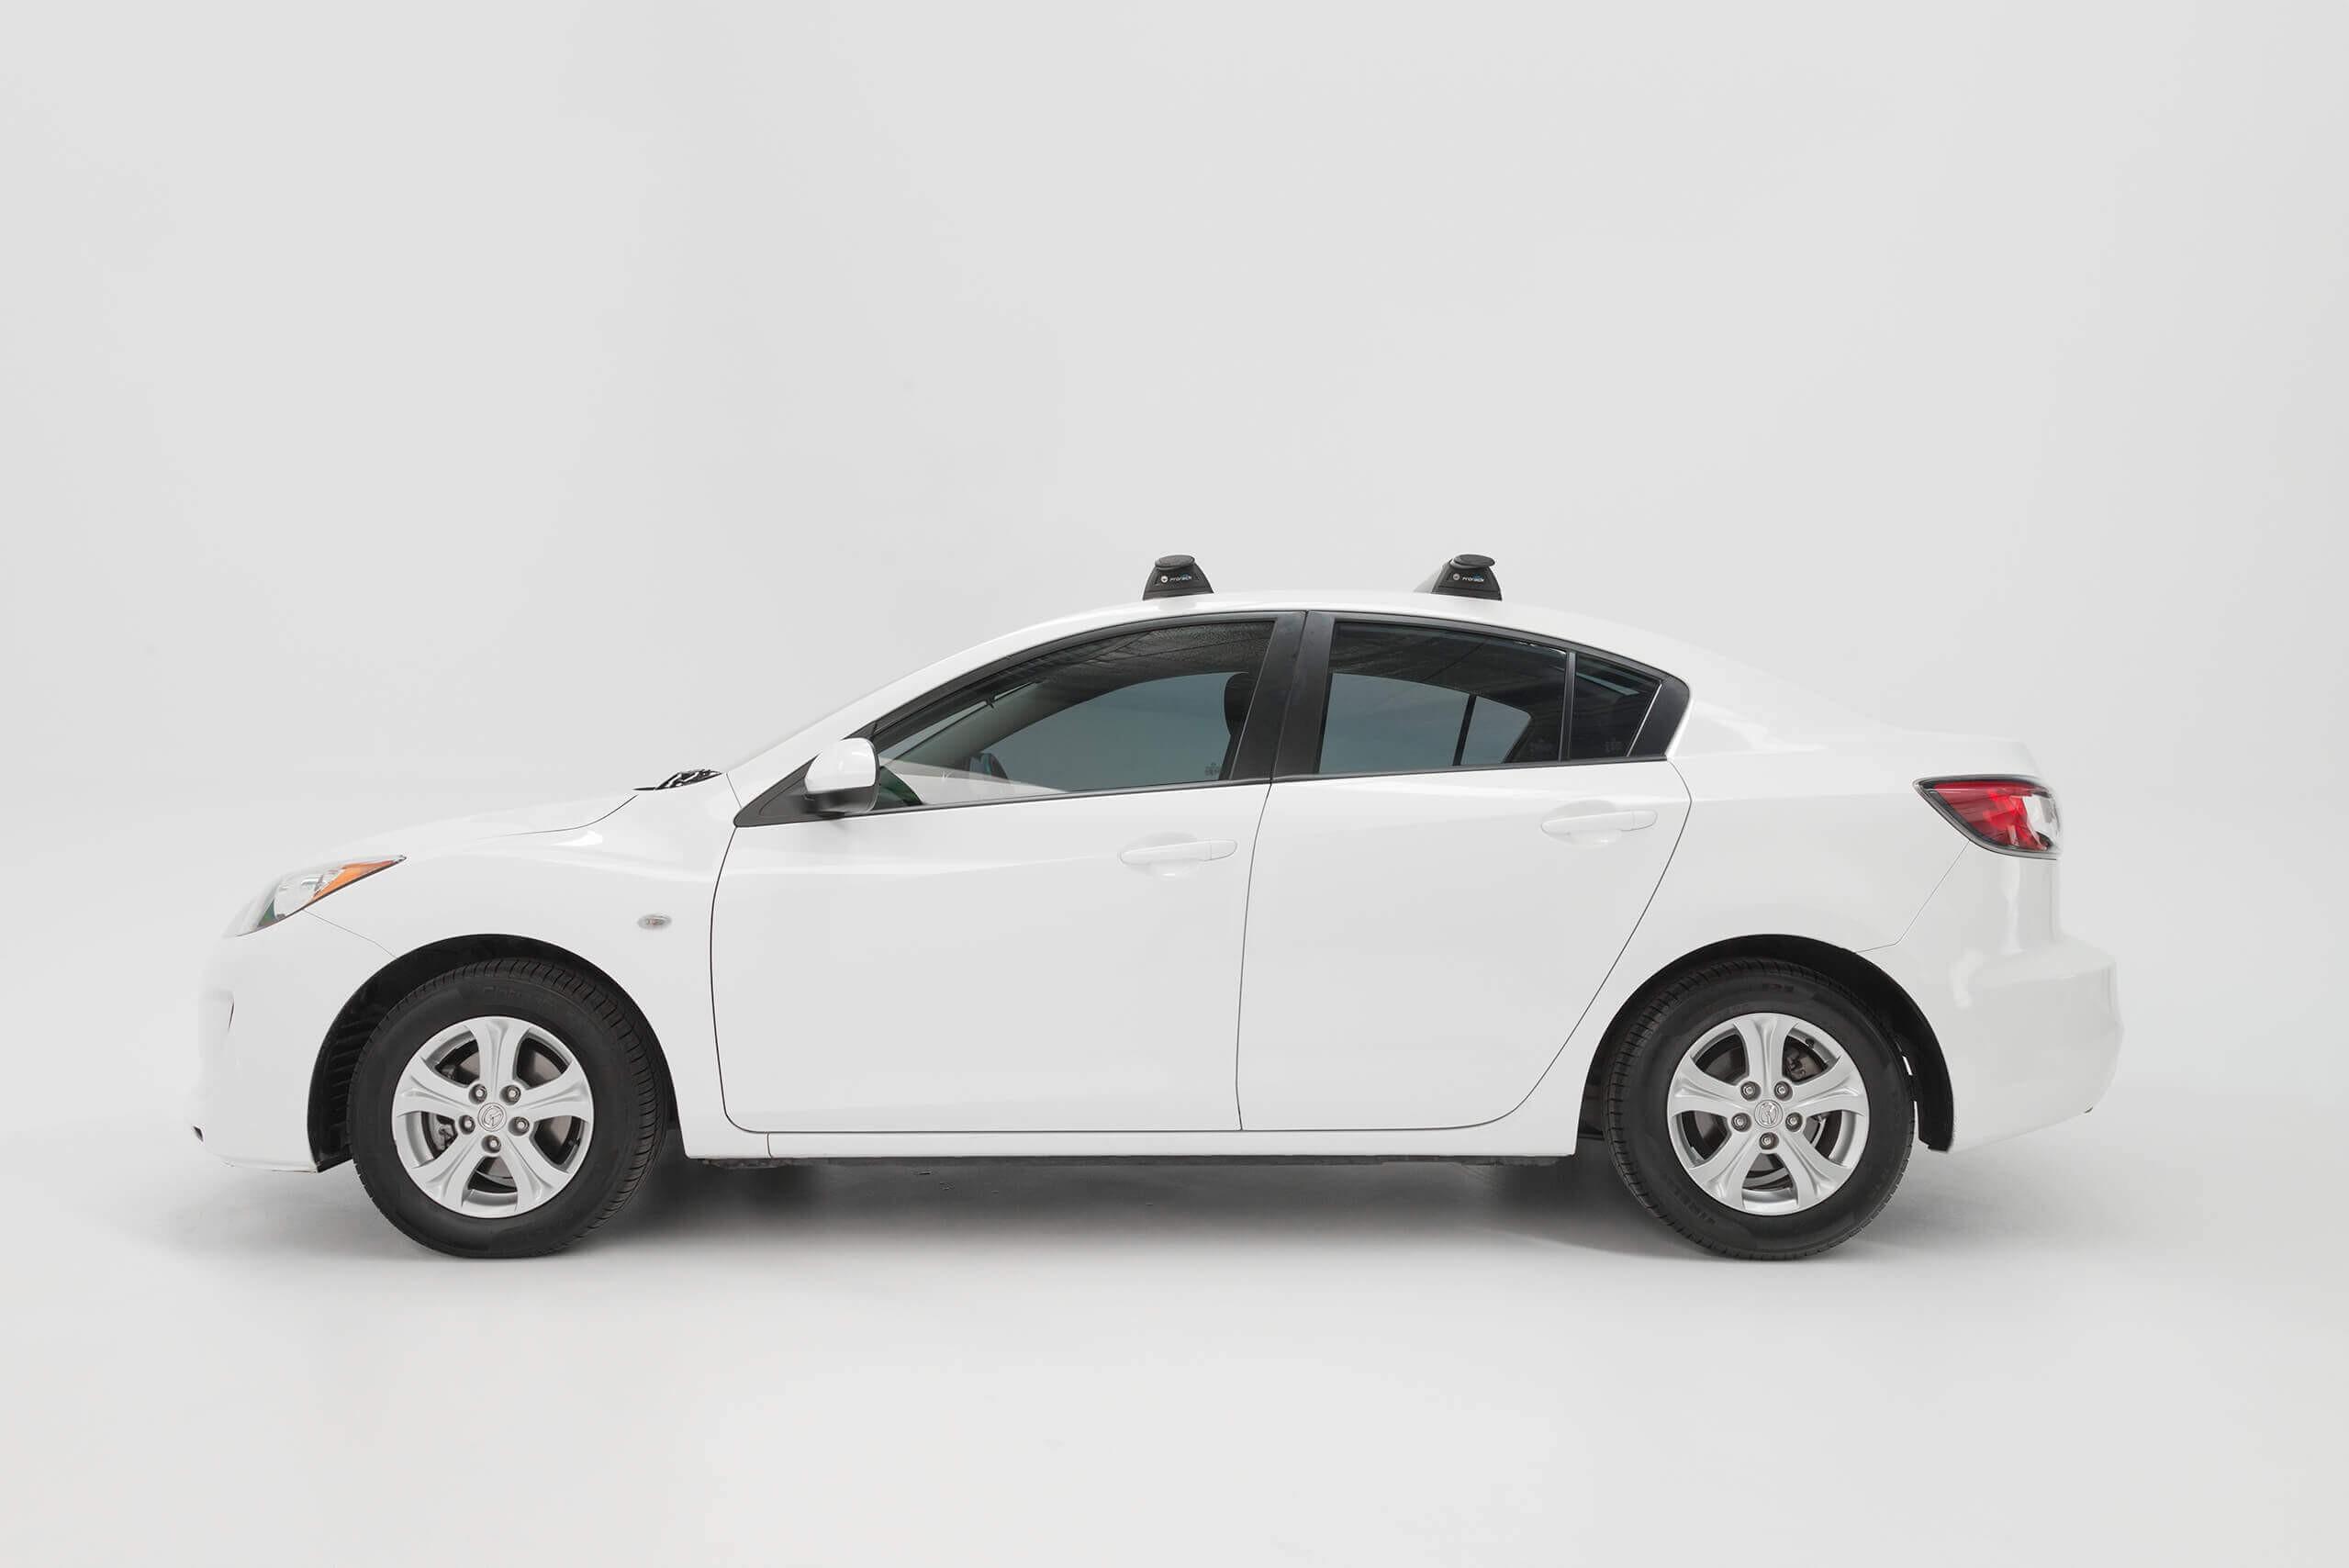 Mazda 3 Service Manual: Vacuum Line Inspection